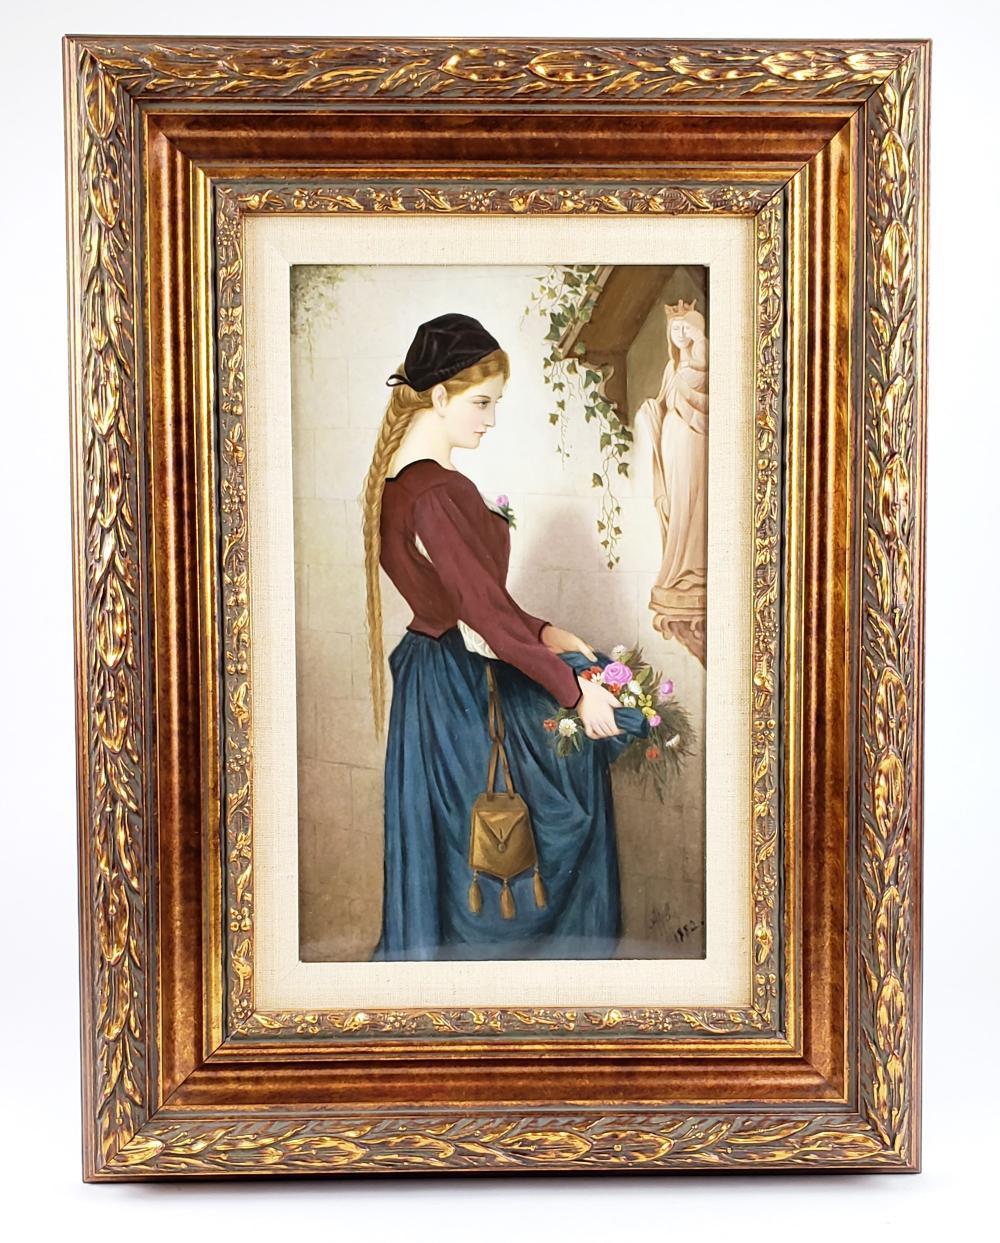 Magnificent 19th C. KPM Plaque of Marguerite